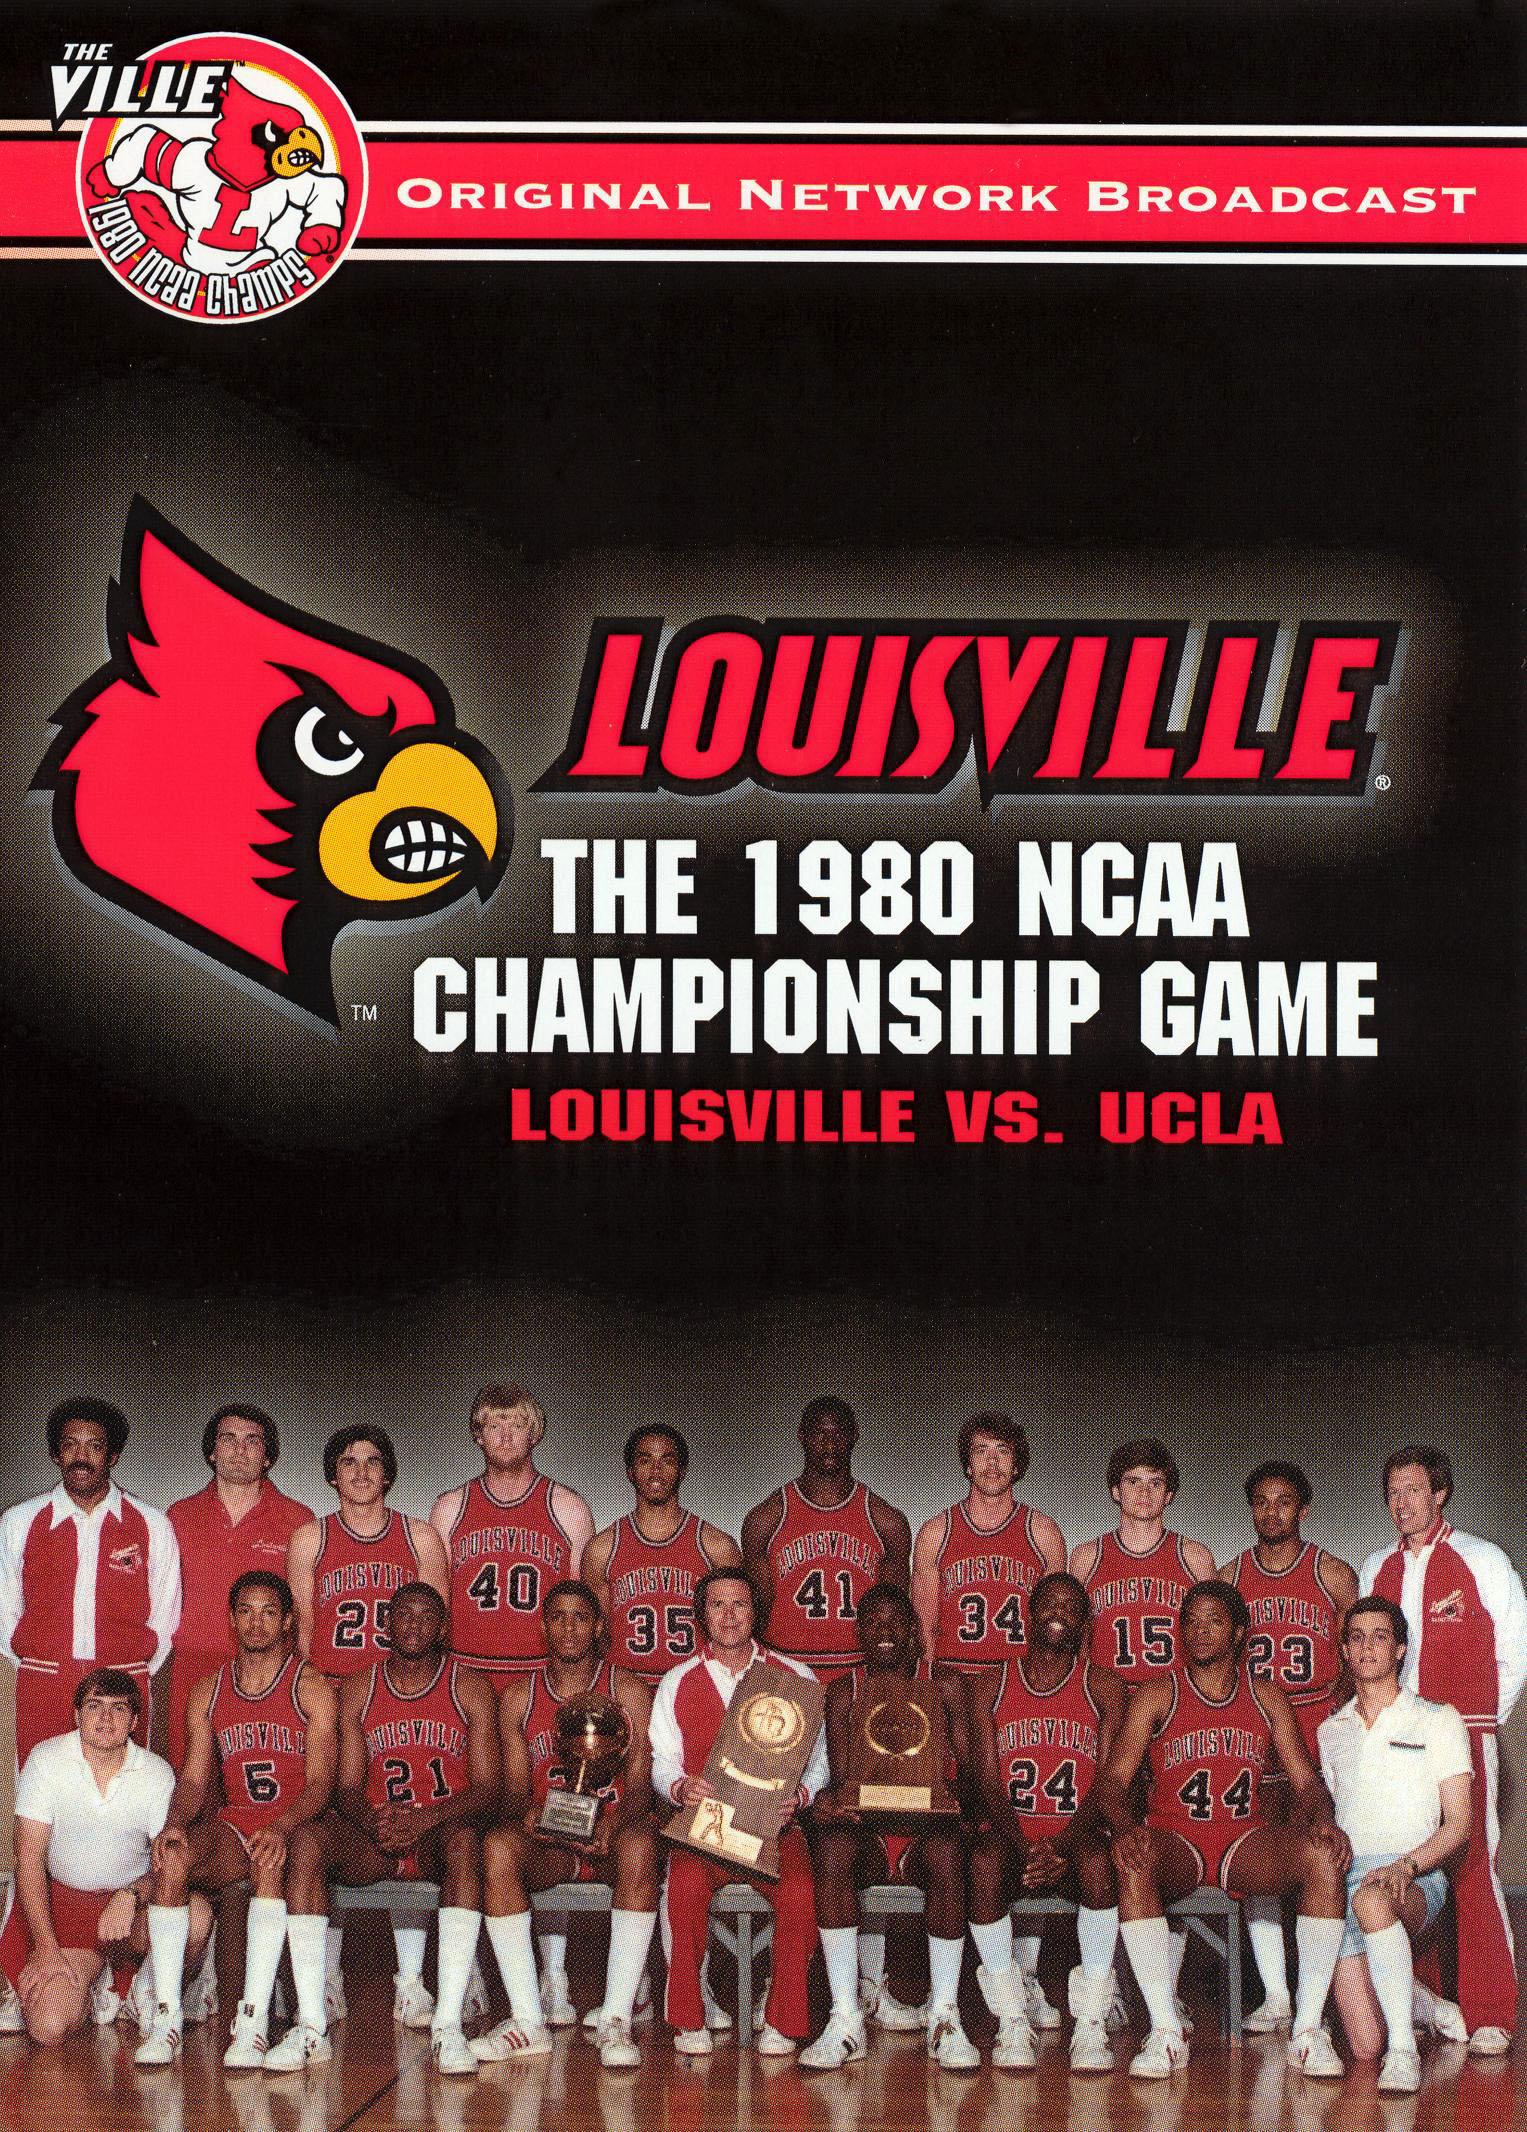 The 1980 NCAA Championship Game - Louisville vs UCLA